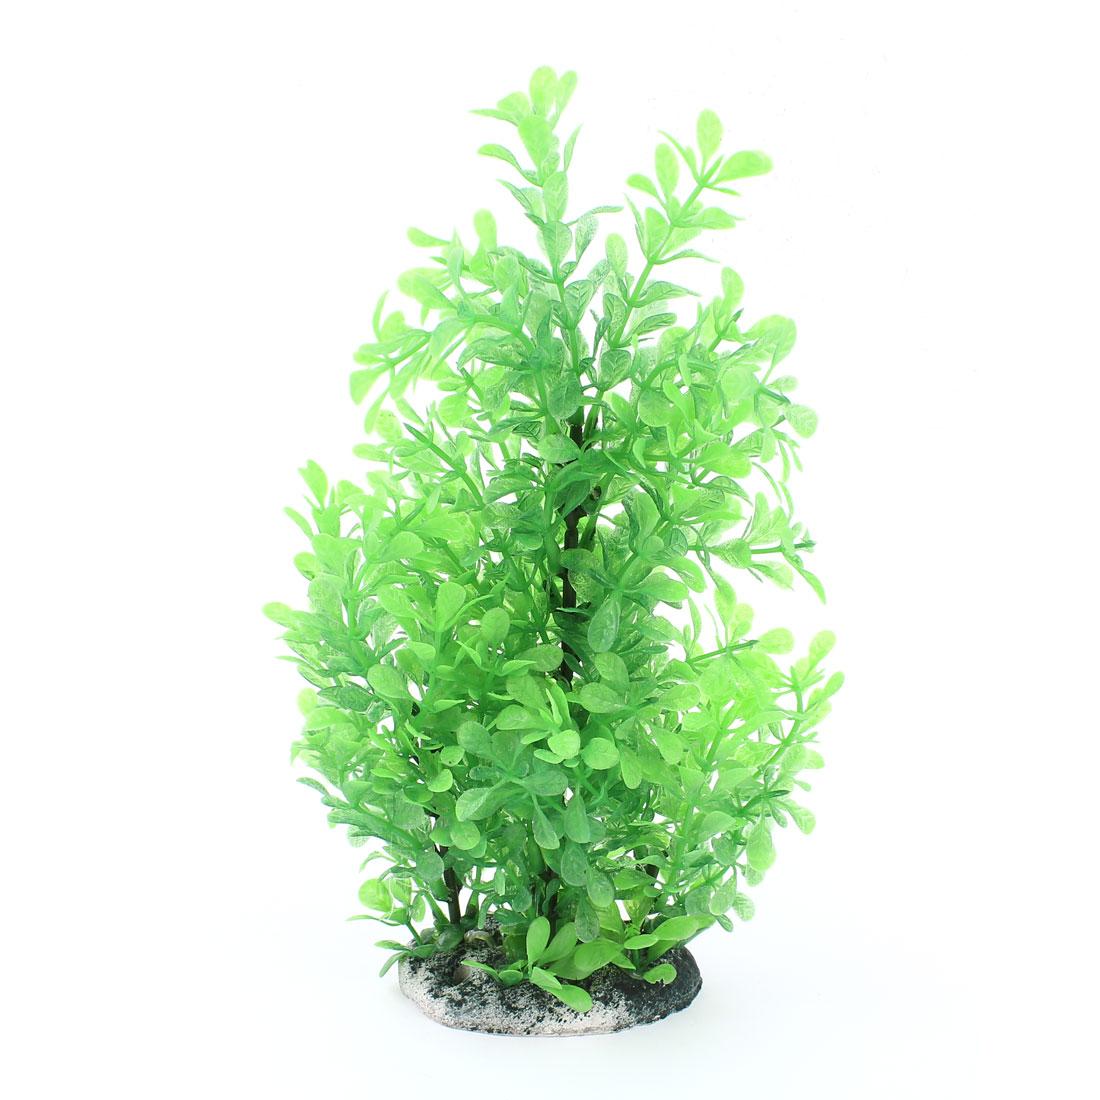 "11"" High Green Plastic Artificial Tree Water Plant Decor for Aquarium"